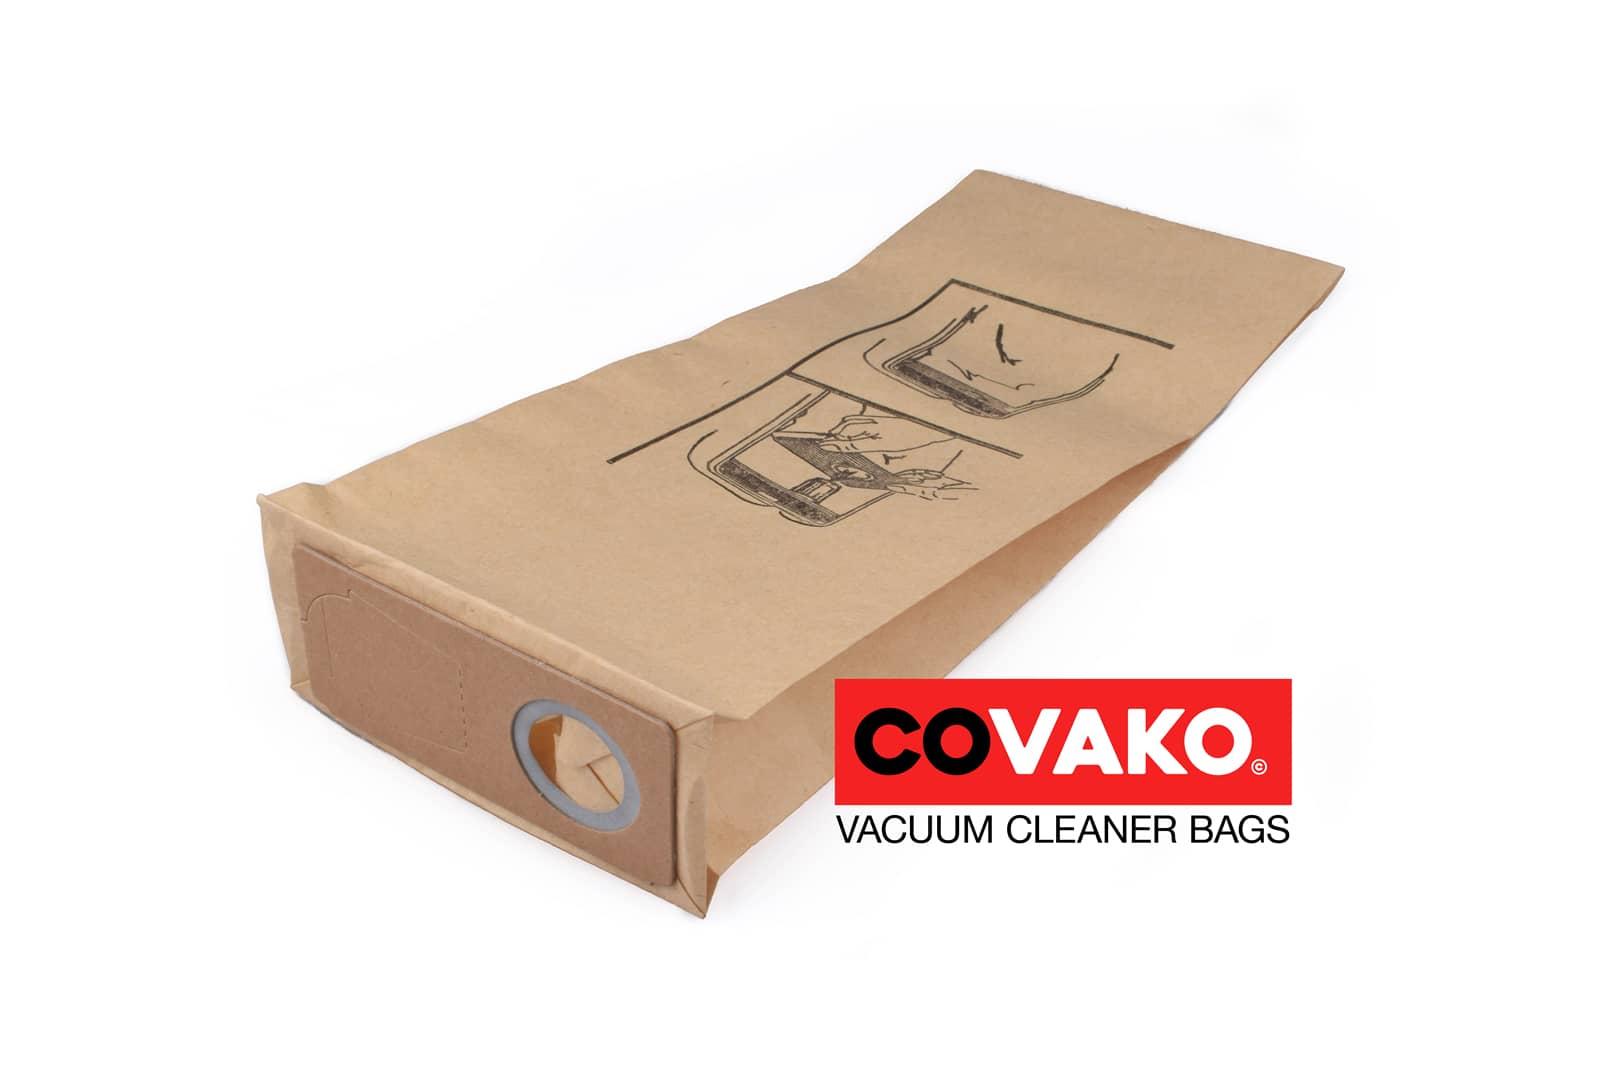 Electrolux DU 135 / Paper - Electrolux vacuum cleaner bags